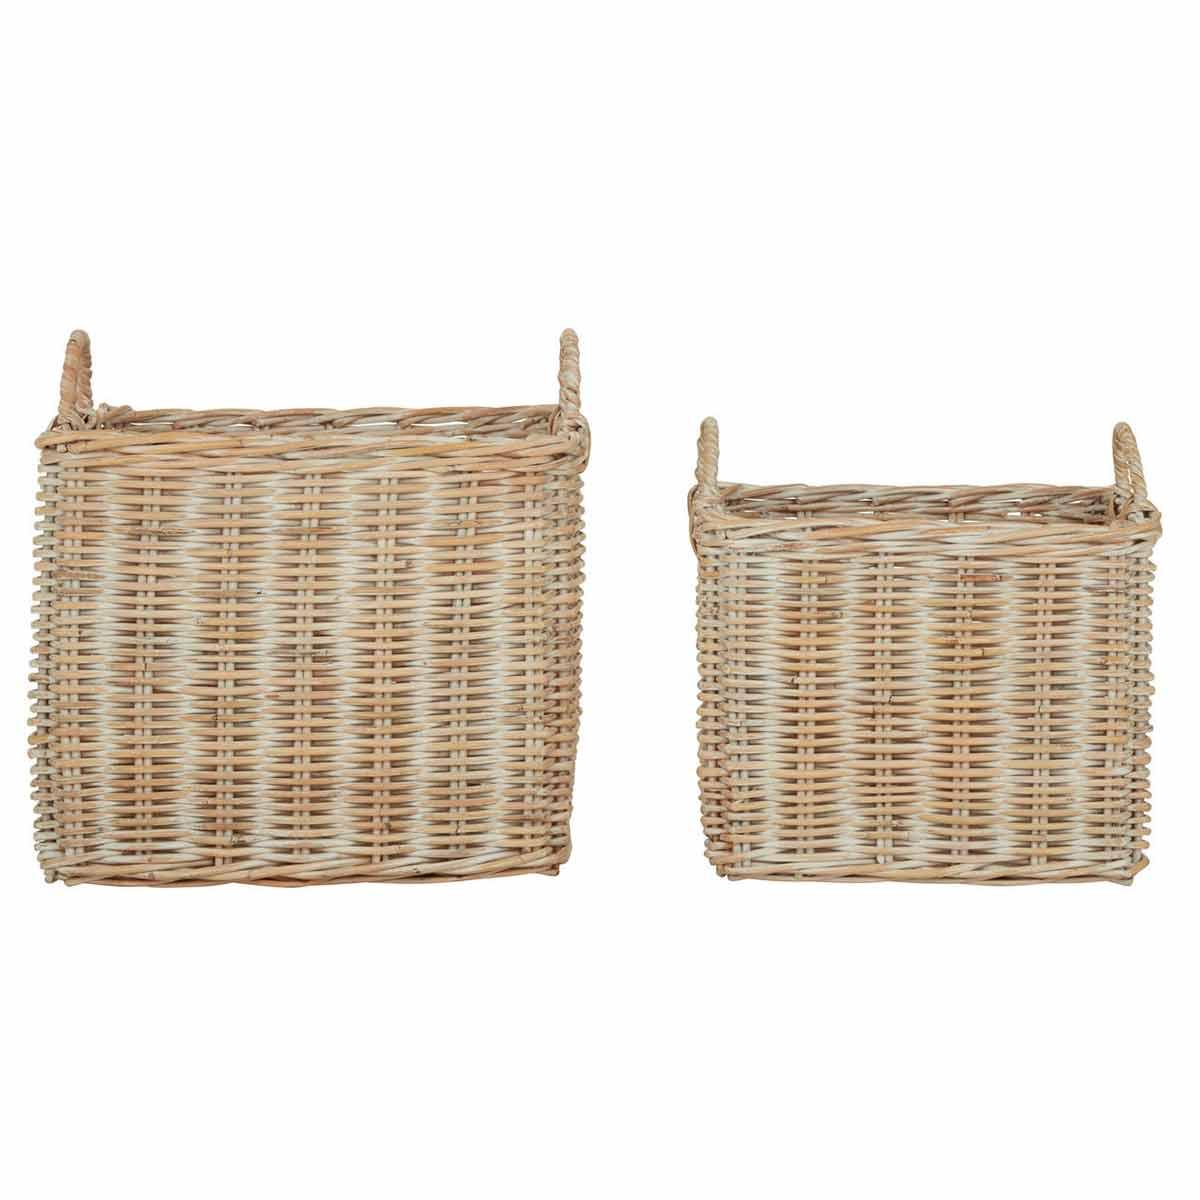 Argento Storage Baskets Whitewash Set of 2, White